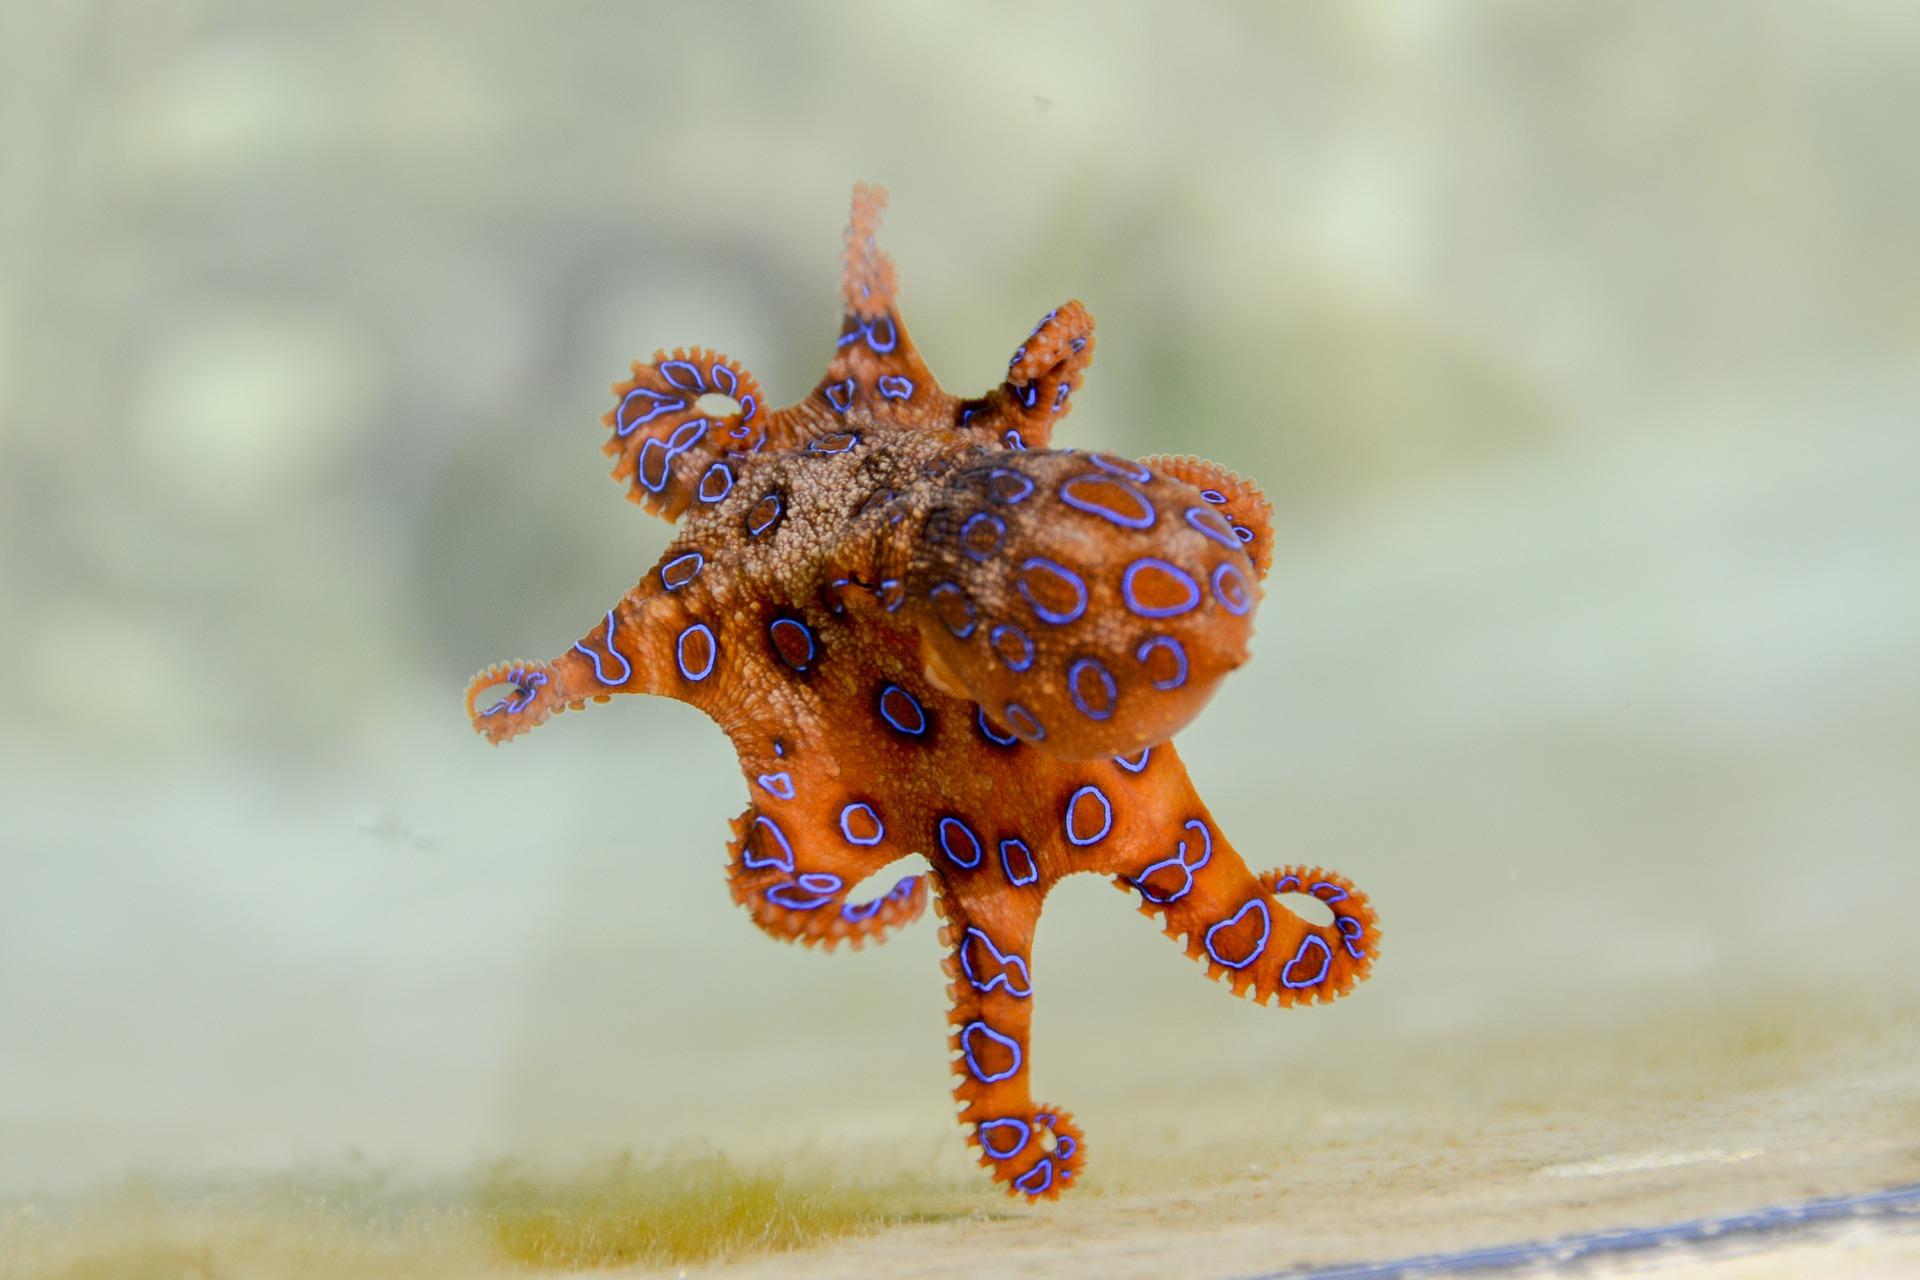 Blaugeringelte, hoch giftige Krake (blue ringed octopus)